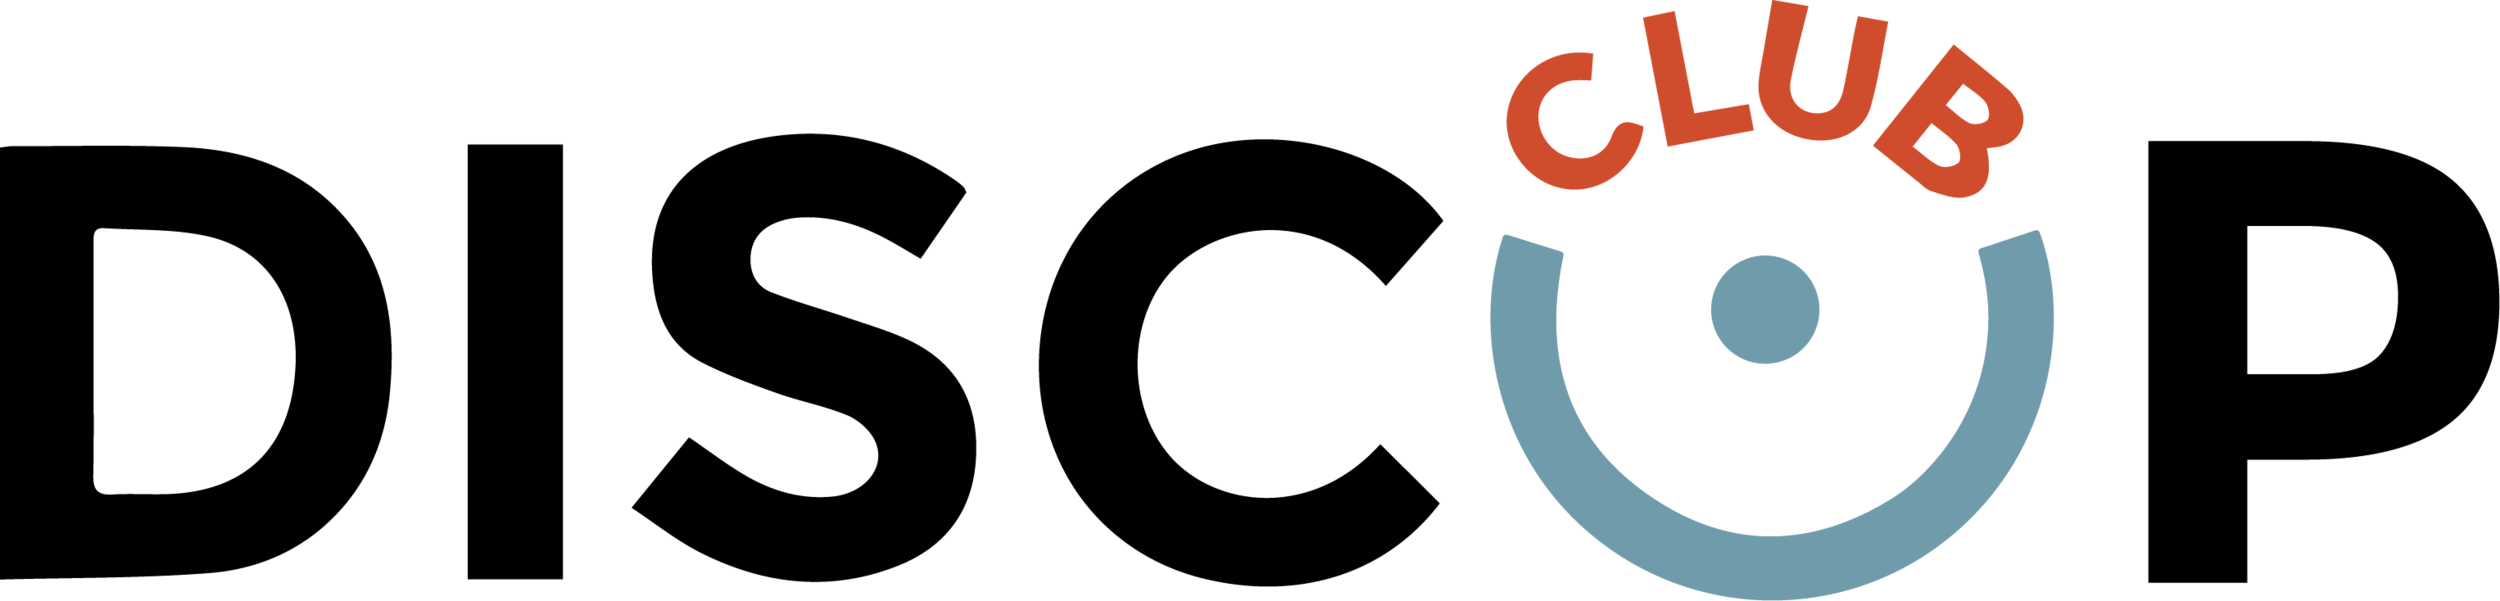 discop club_logo.png